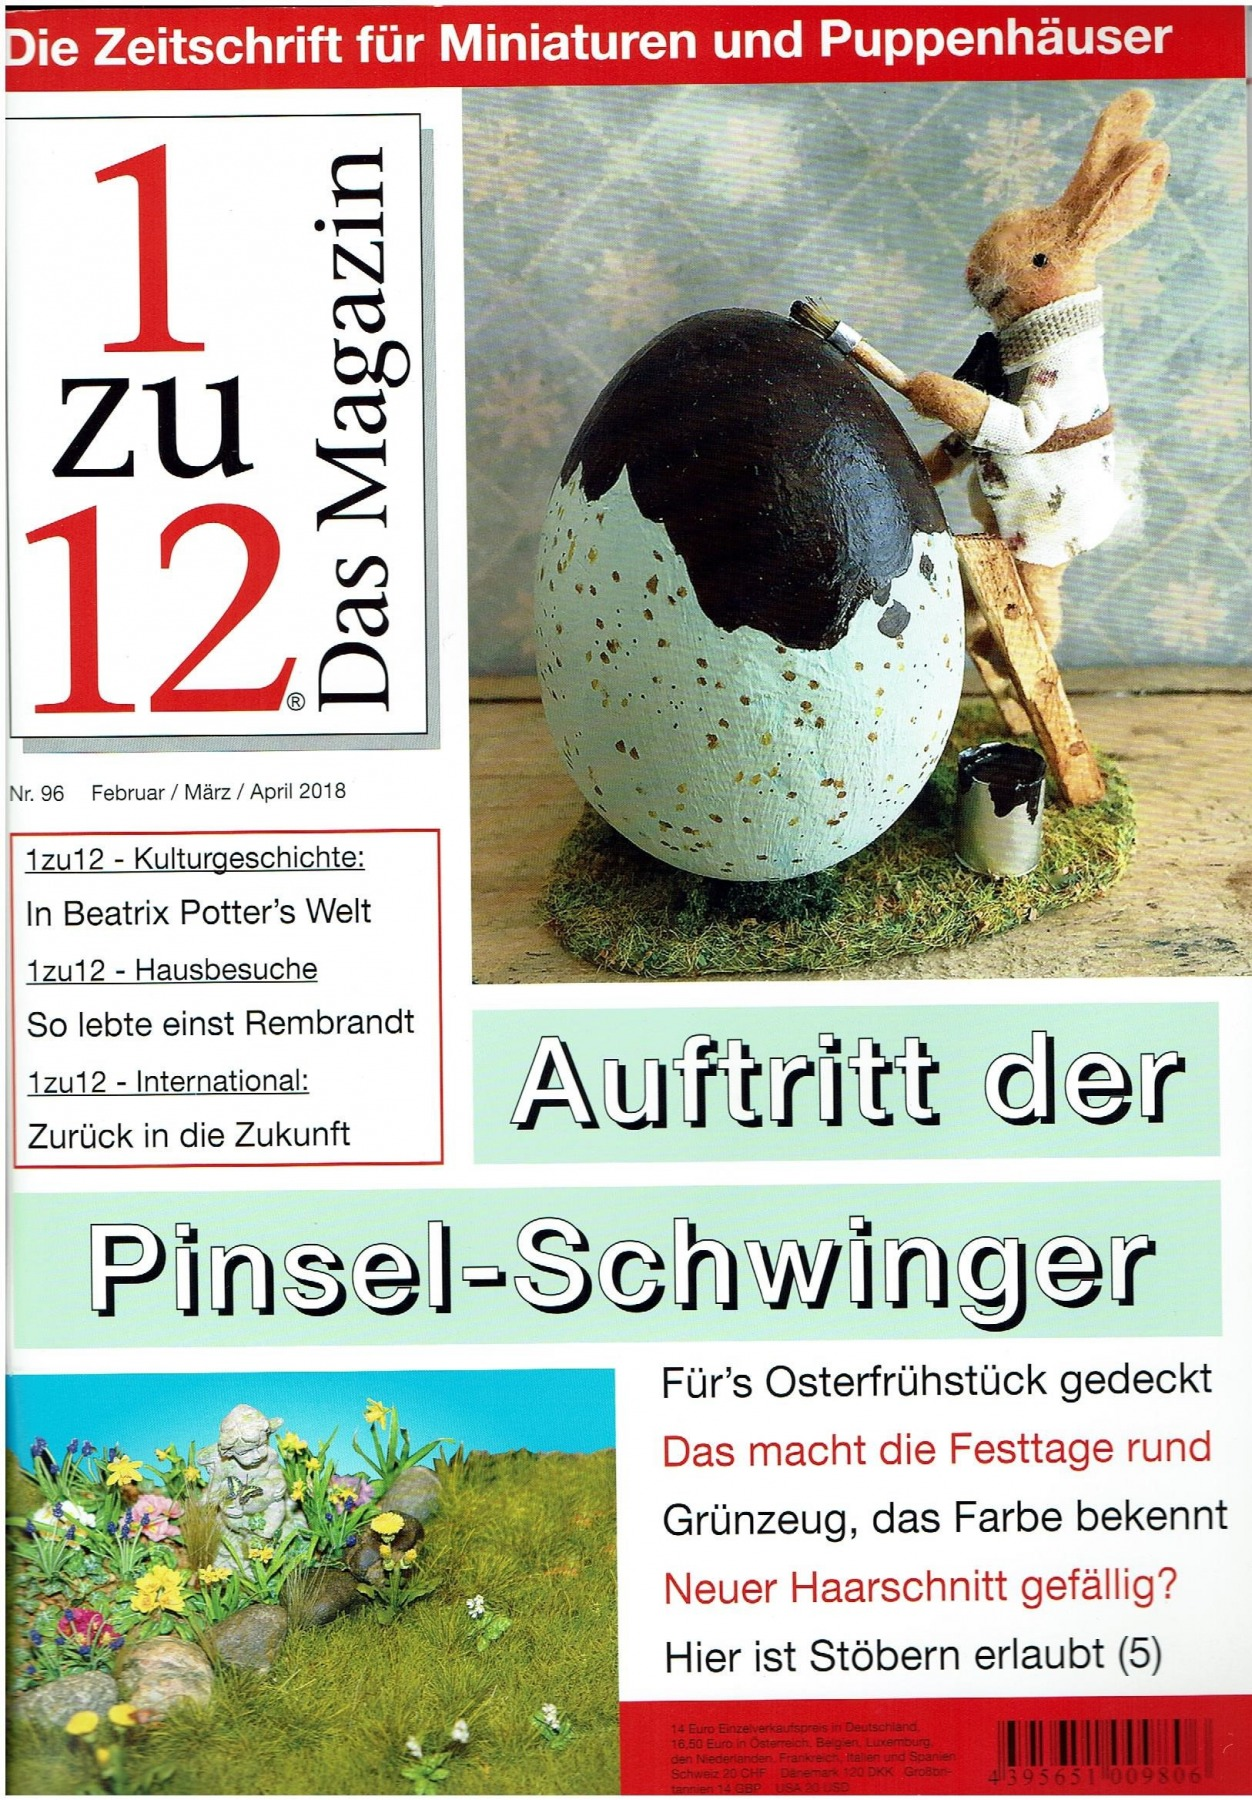 Nr 96- 1zu12 Das Magazin Februar/März/April